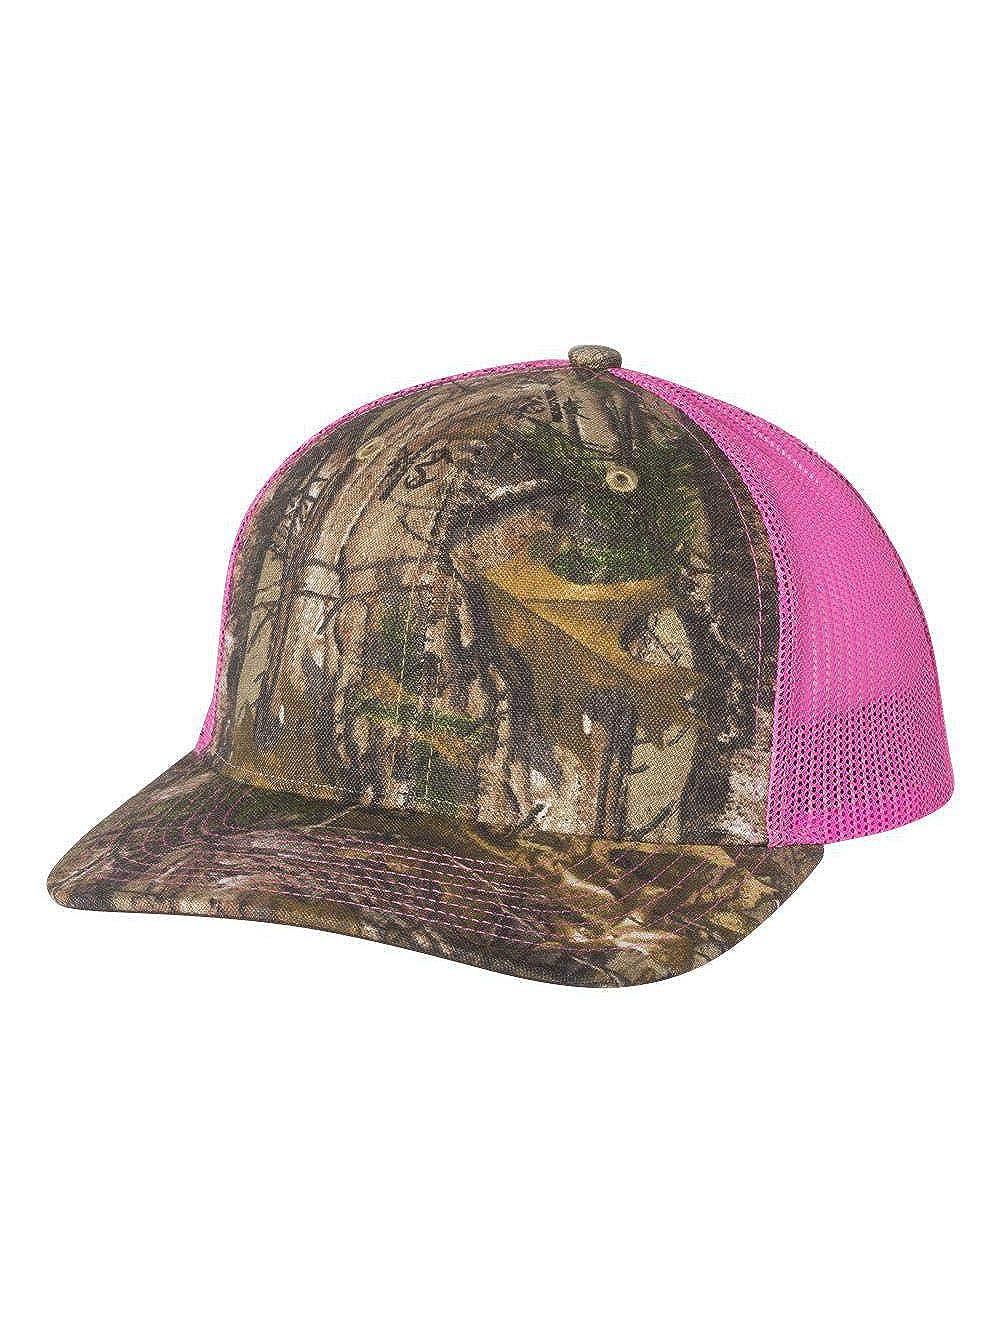 8f3c92b13cc763 Richardson Patterned Snapback Trucker Cap Adjustable Realtree Edge/Neon  Pink at Amazon Men's Clothing store: